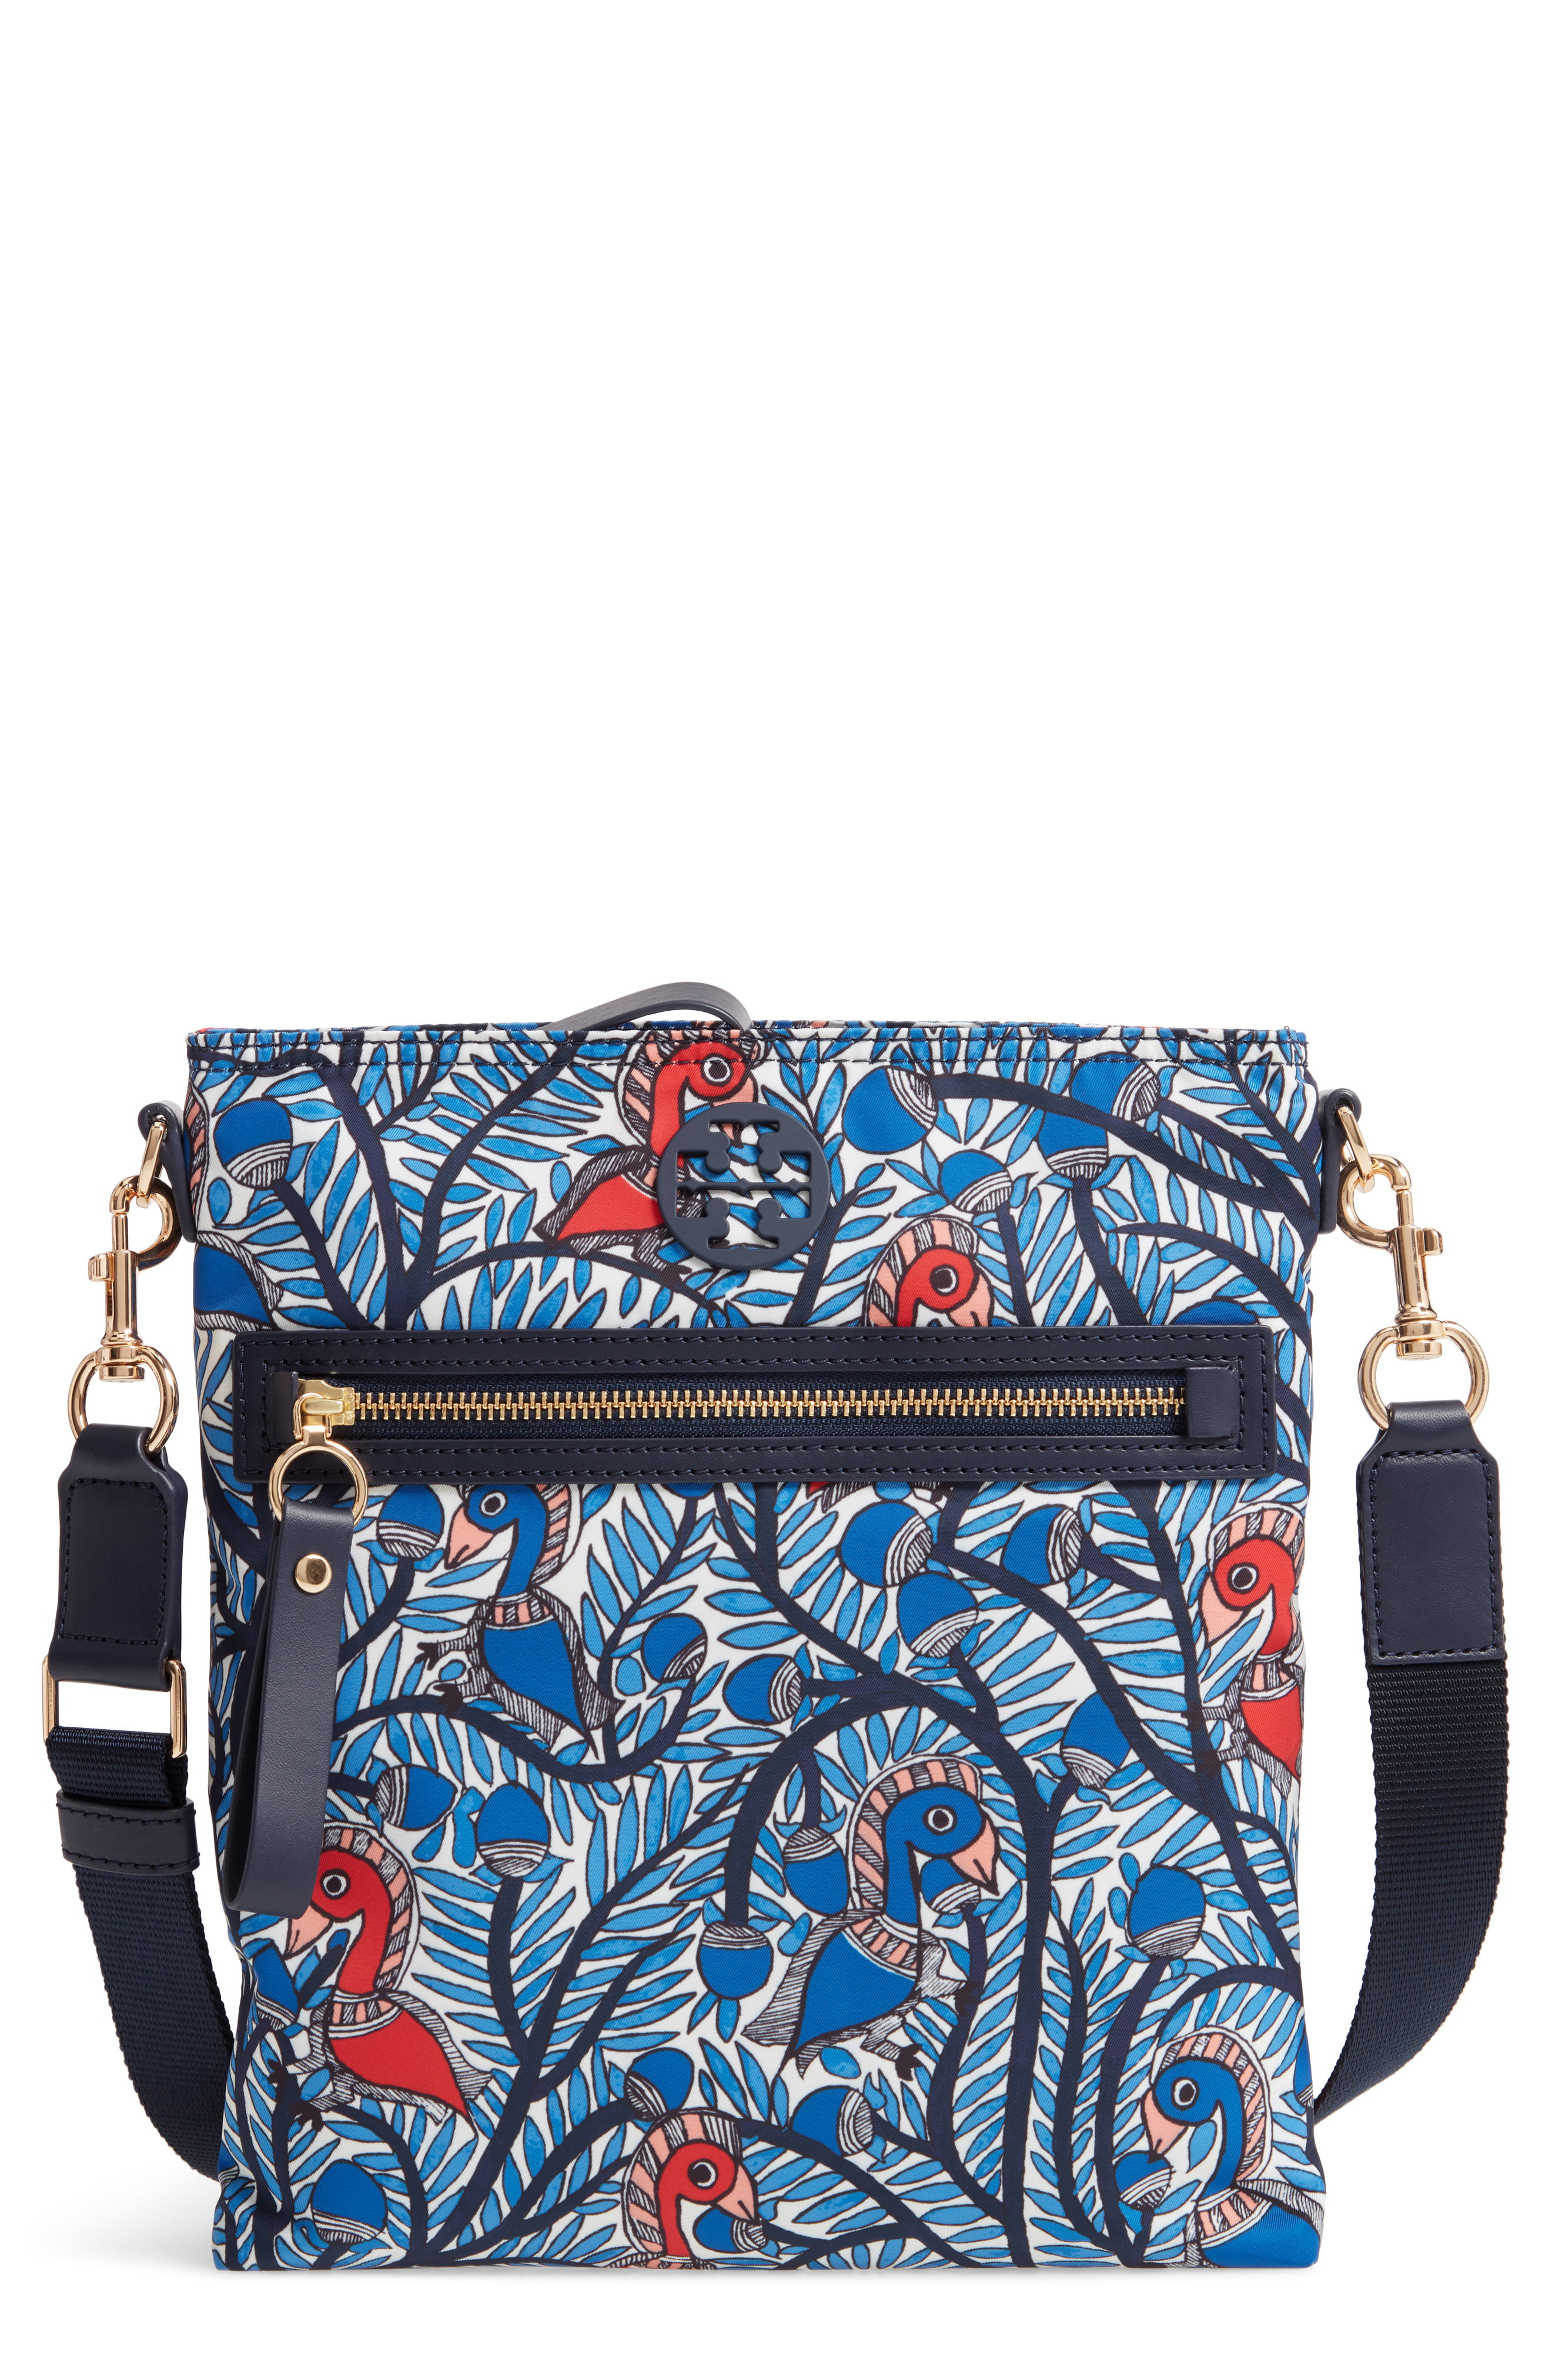 b29197fd7 Tory Burch Tilda Print Nylon Swingpack - Blue in 2019 | Products ...